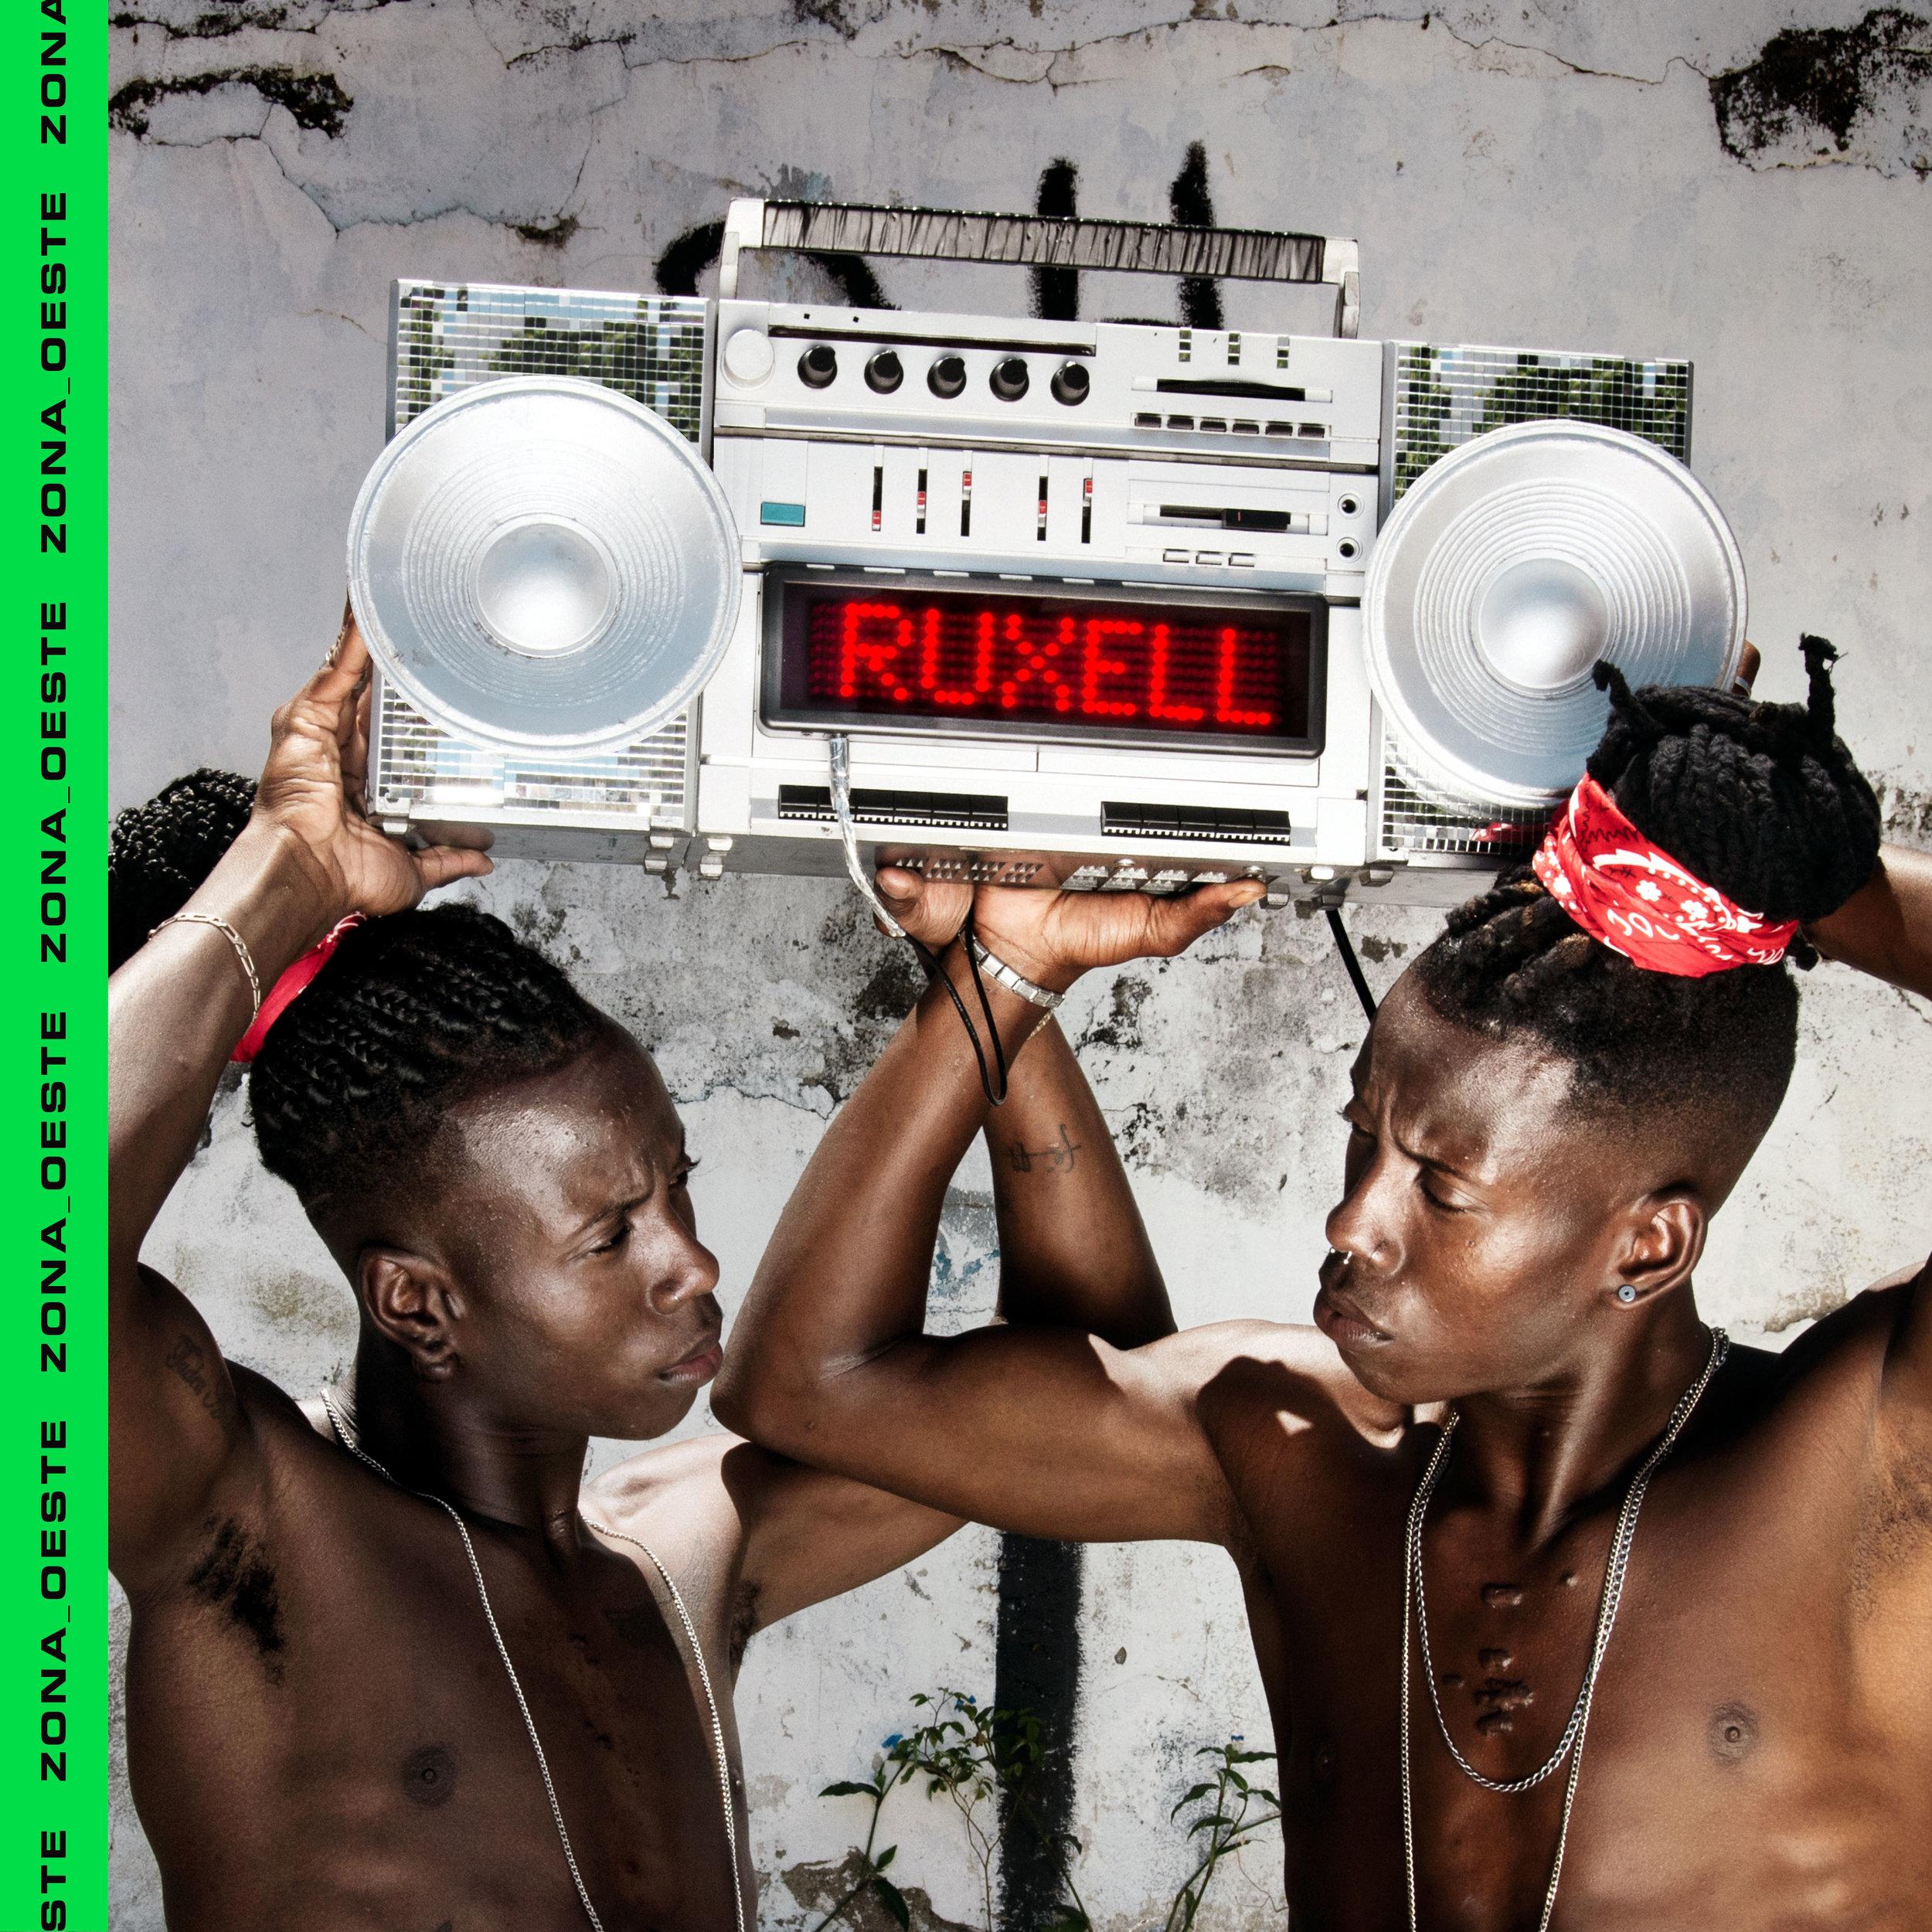 Ruxell - Zona Oeste single cover - photo ��Vincent Rosenblatt - Design by Rel�mpago (RLMPG) agency - Twin models : Tarso & Tadeu Oliveira Amancio - Rio de Janeiro 2017